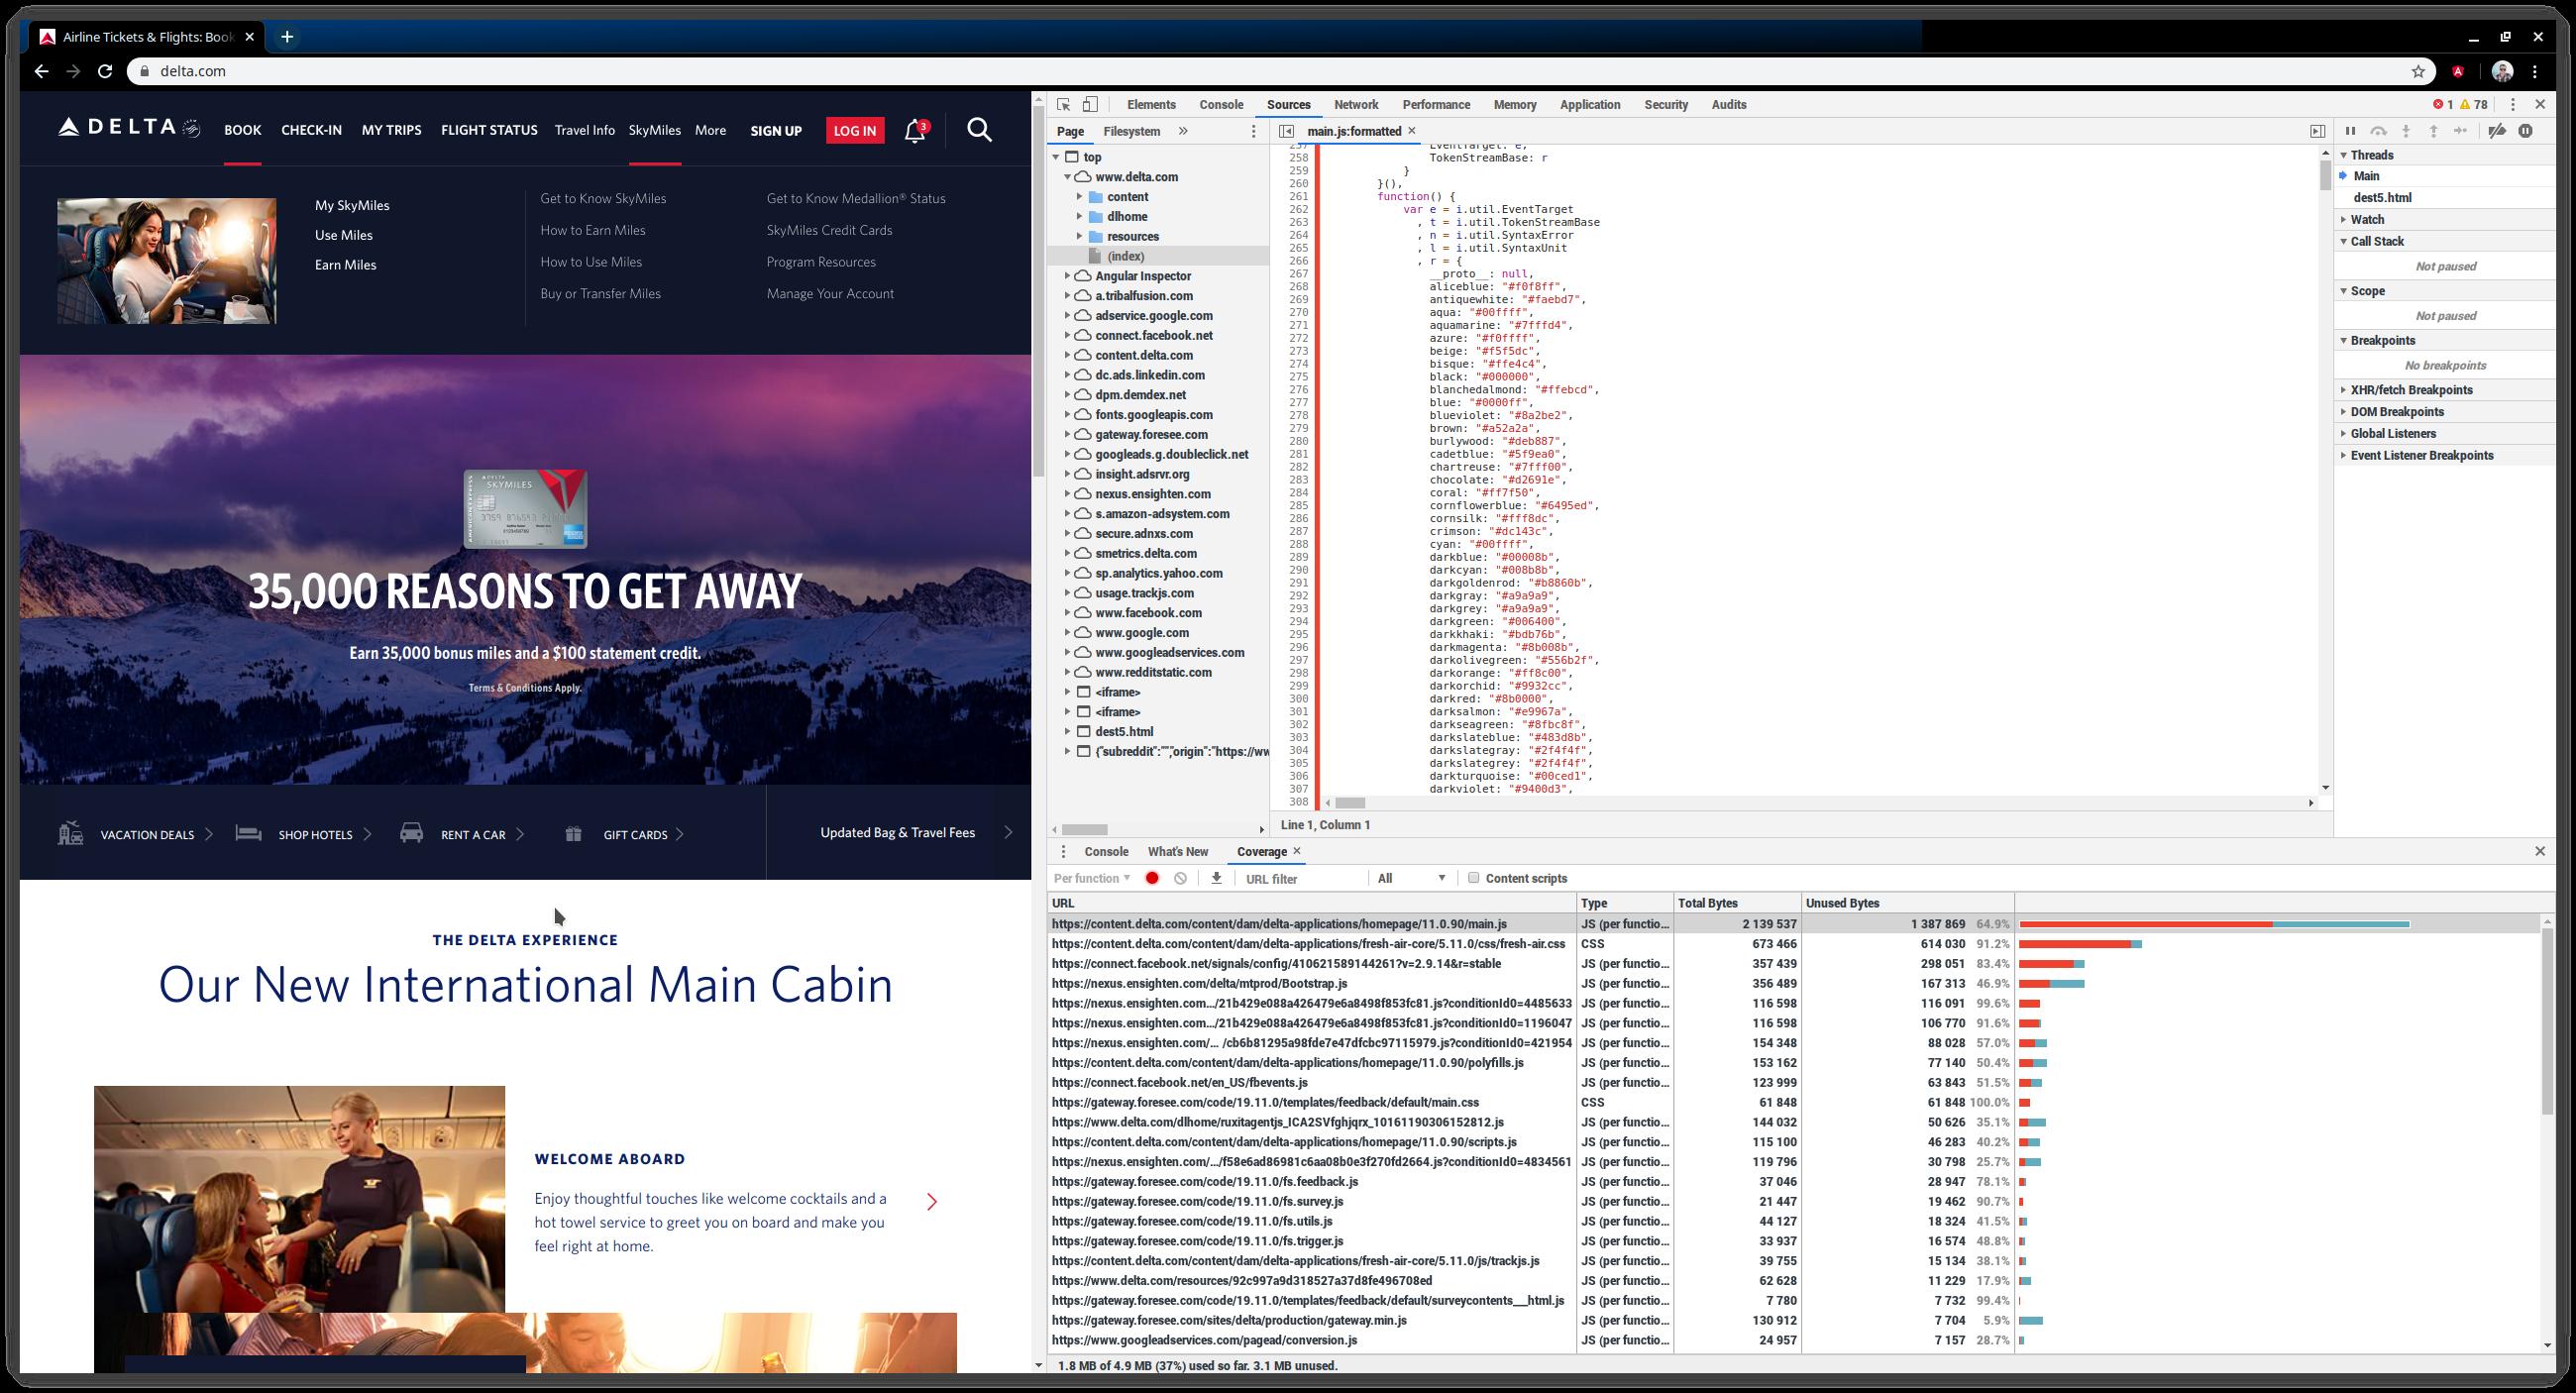 delta.com code coverage shows 64% unused code in main.js